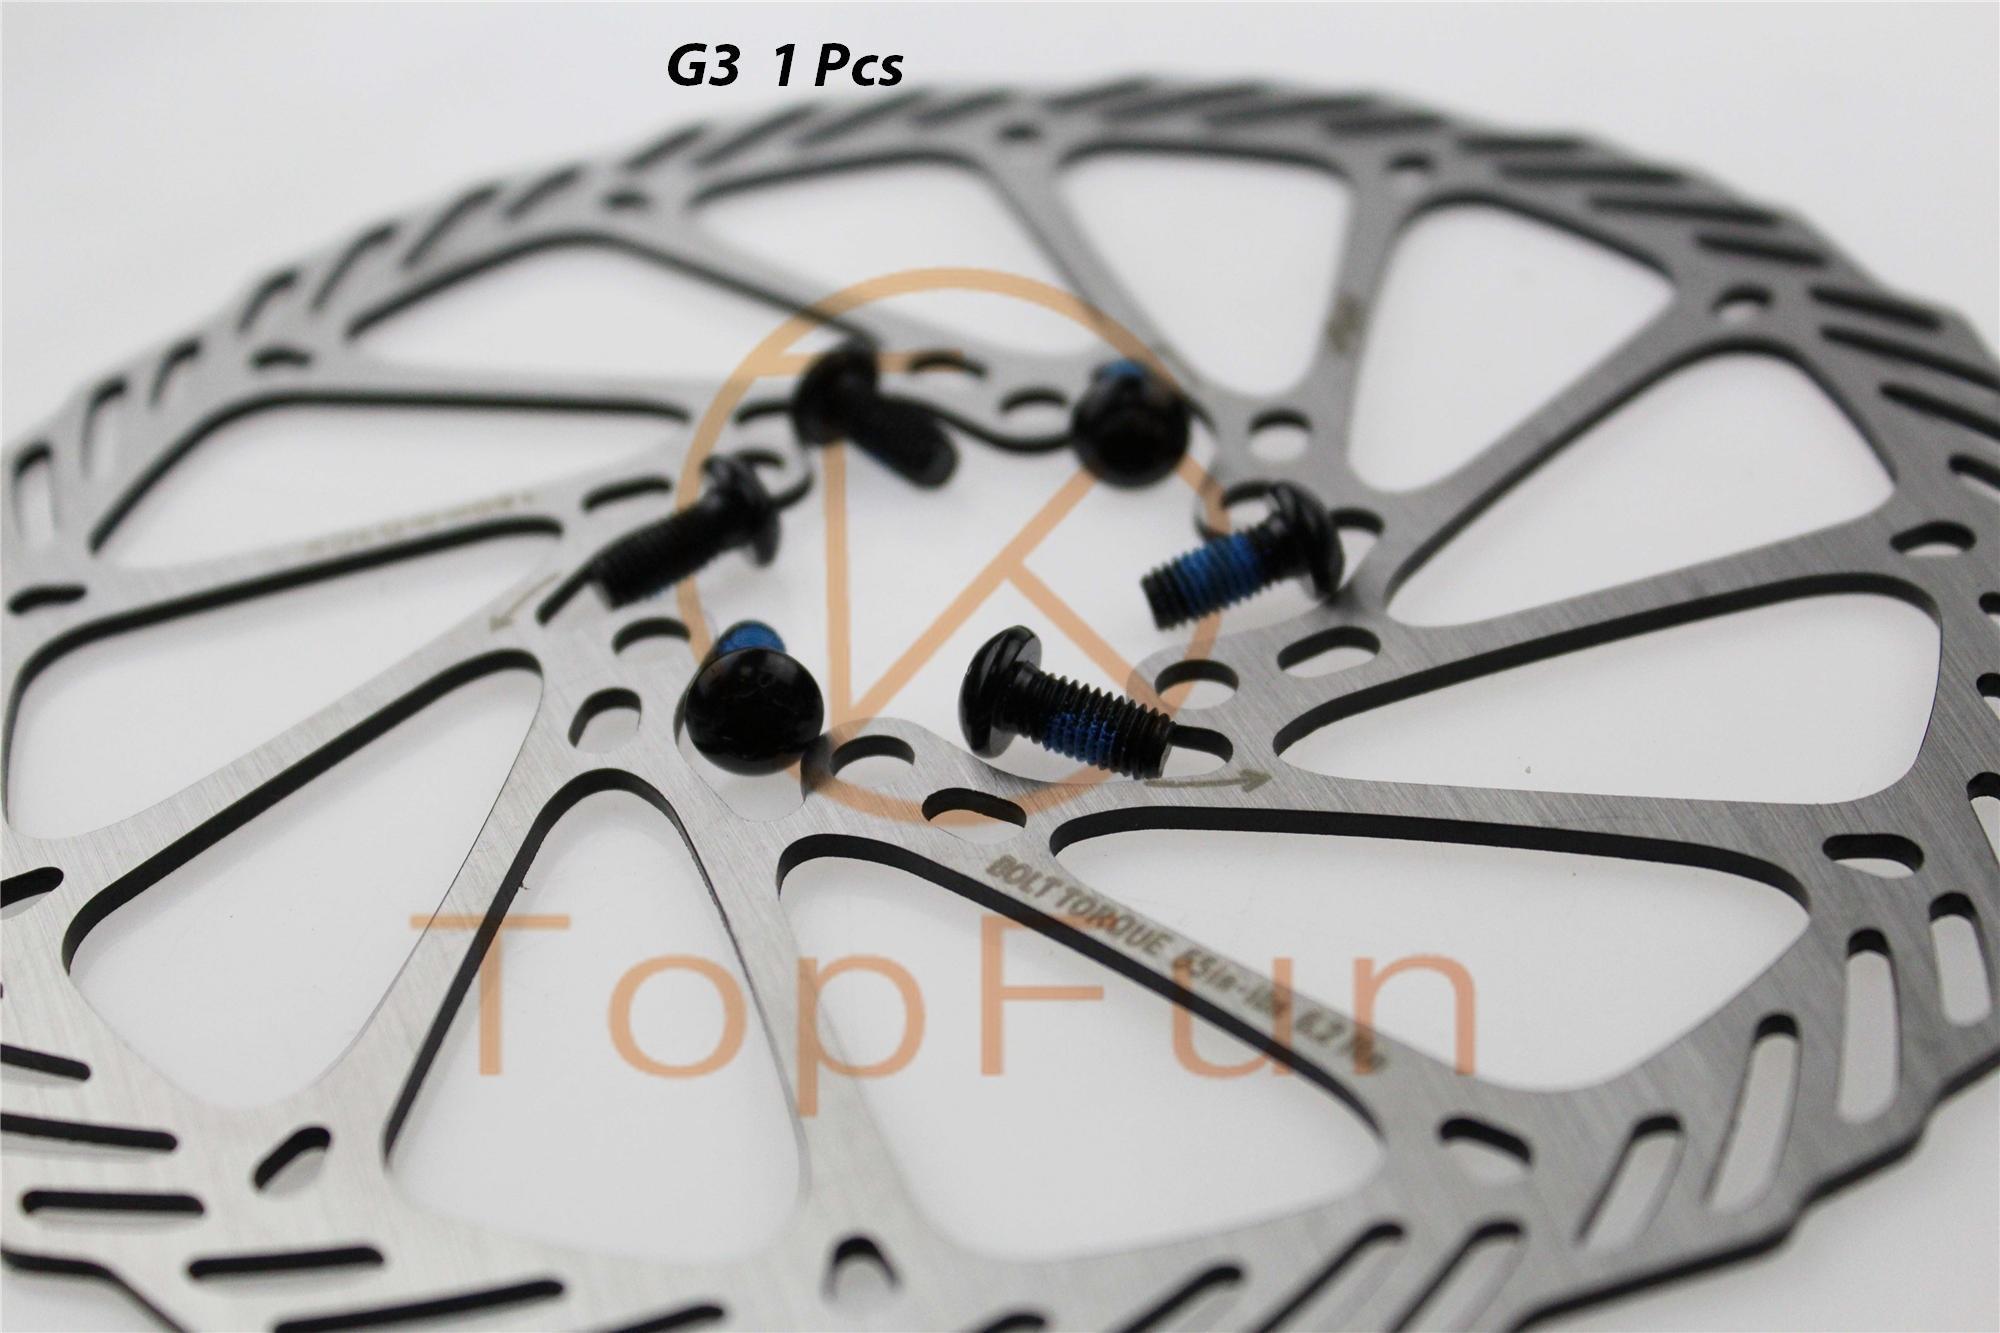 Philippines New Genuine Avid Hs1 G3 Disc Brake Rotor 160mm With Sram Centerline 180mm 1pc Bolts Bb5 Bb7 Intl